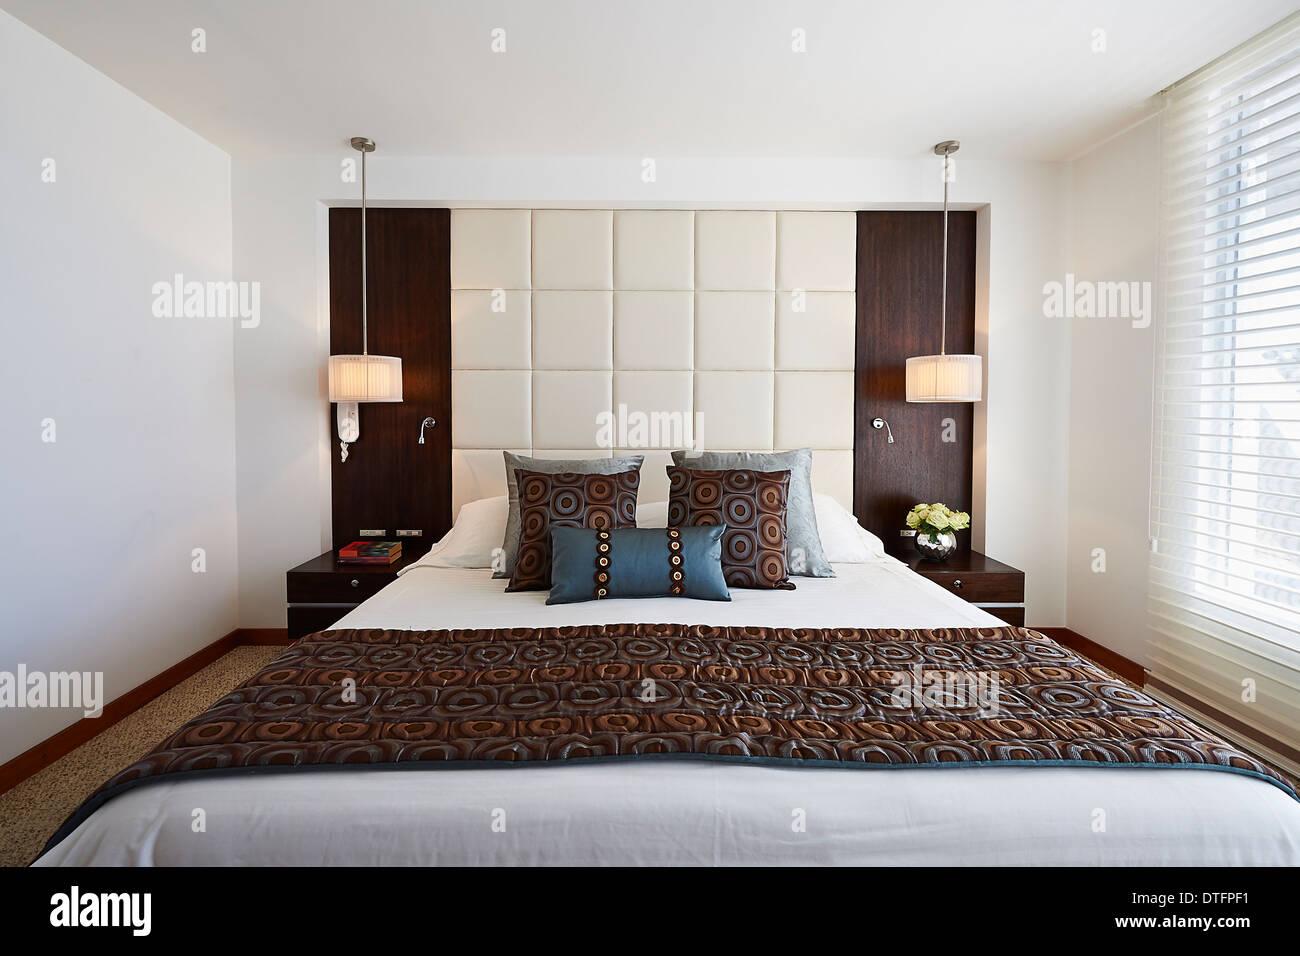 Innenarchitektur: große moderne elegante Schlafzimmer Stockfoto ...